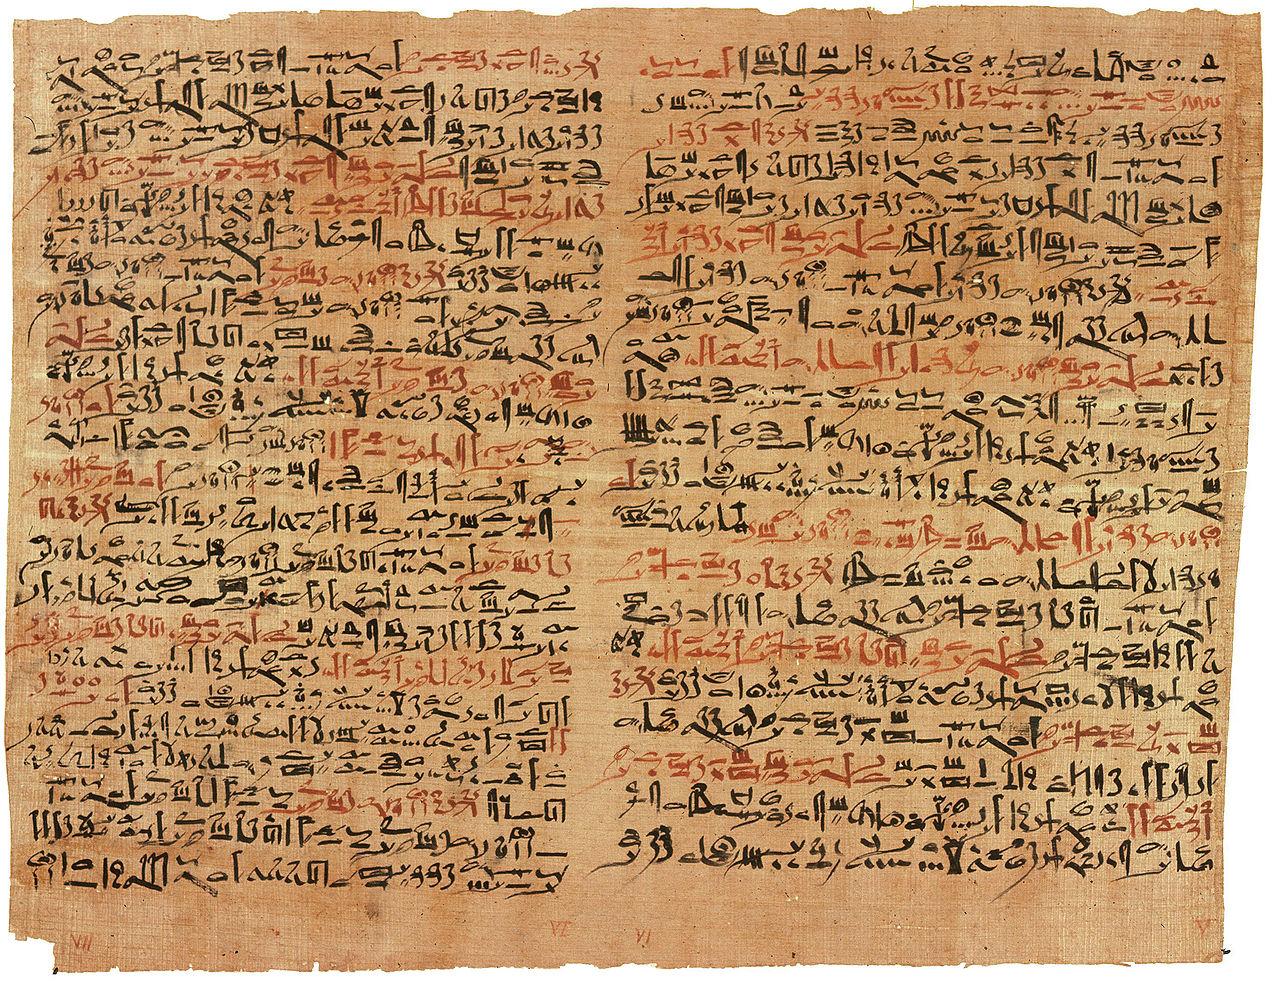 Edwin Smith Papyrus